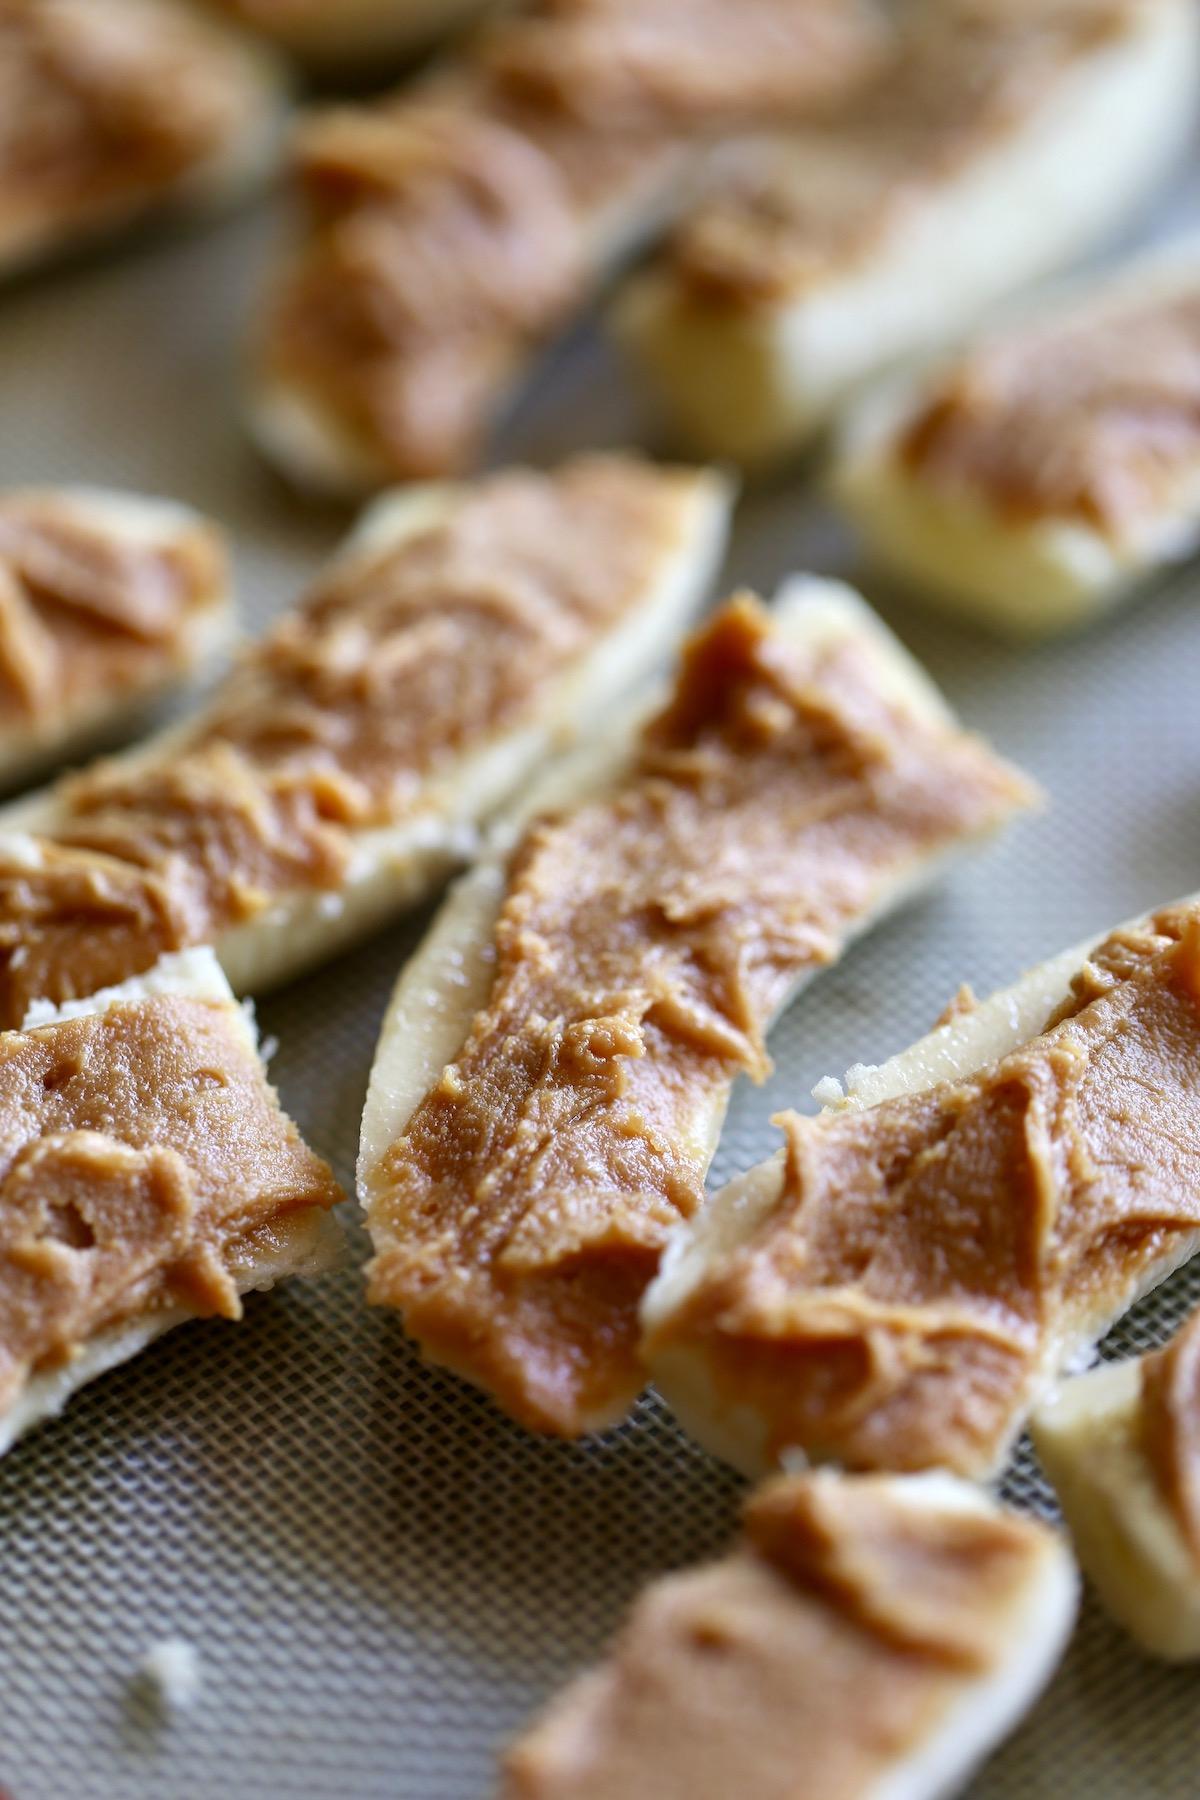 sweet peanut butter spread on sliced banana